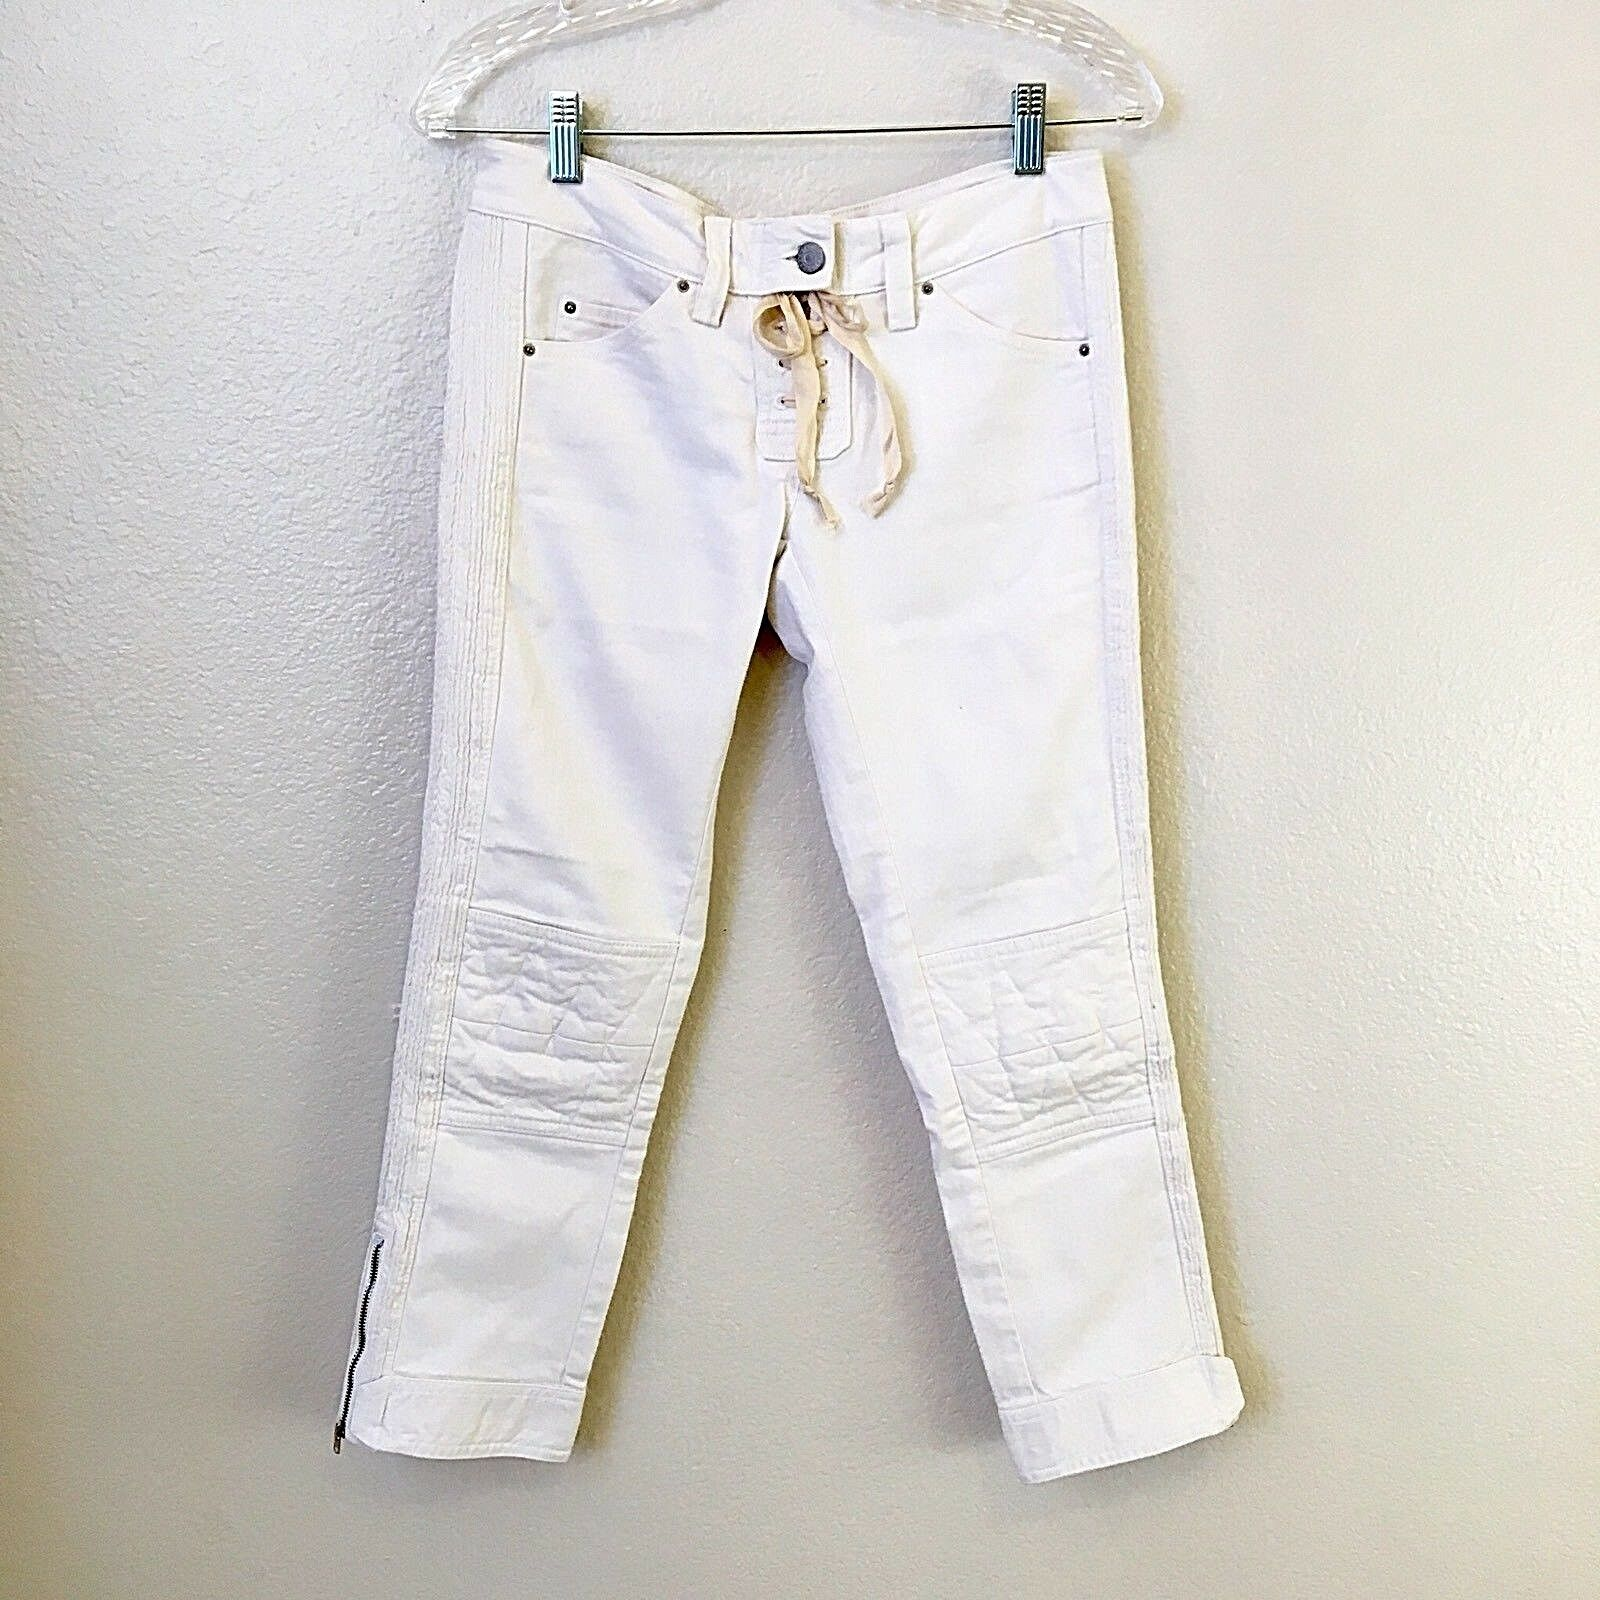 Isabel Marant Miro Cropped Jeans Size 2 White  395